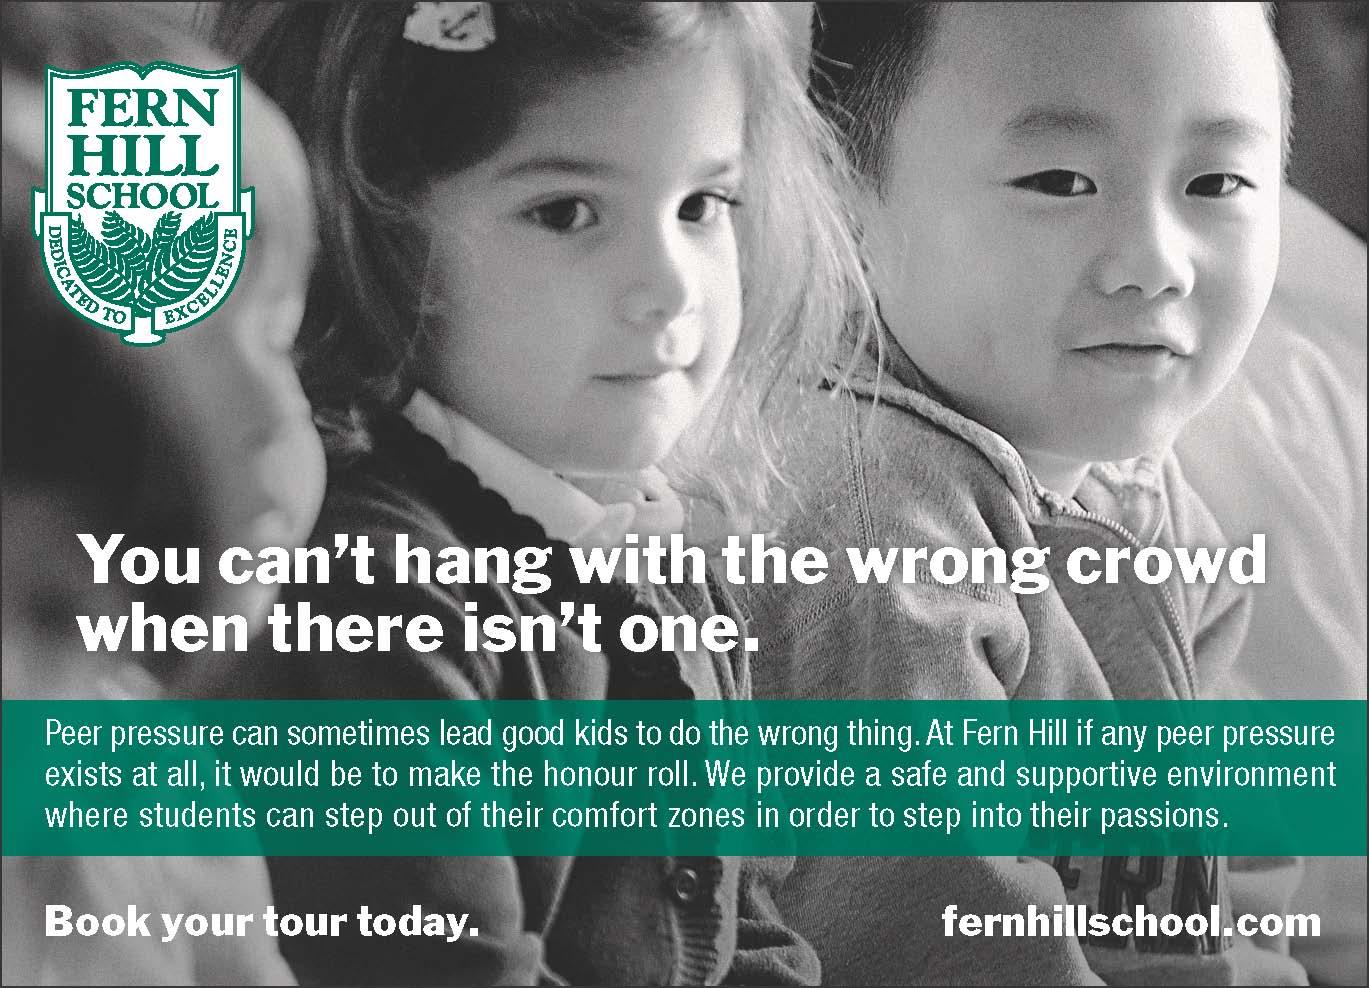 Fern Hill _Can't hang_ ad.jpg